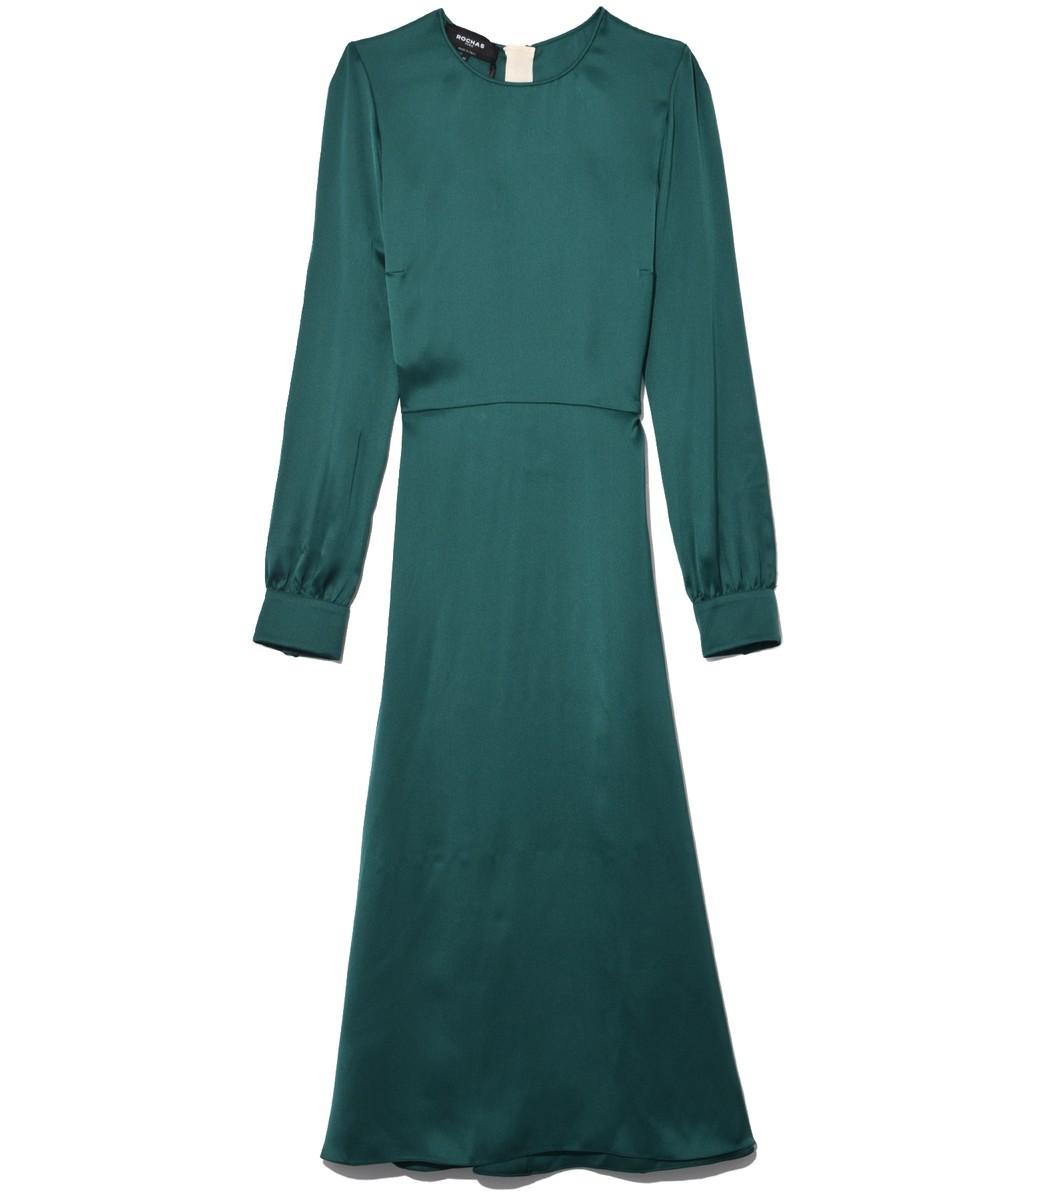 ROCHAS Dark Green A Line Dress